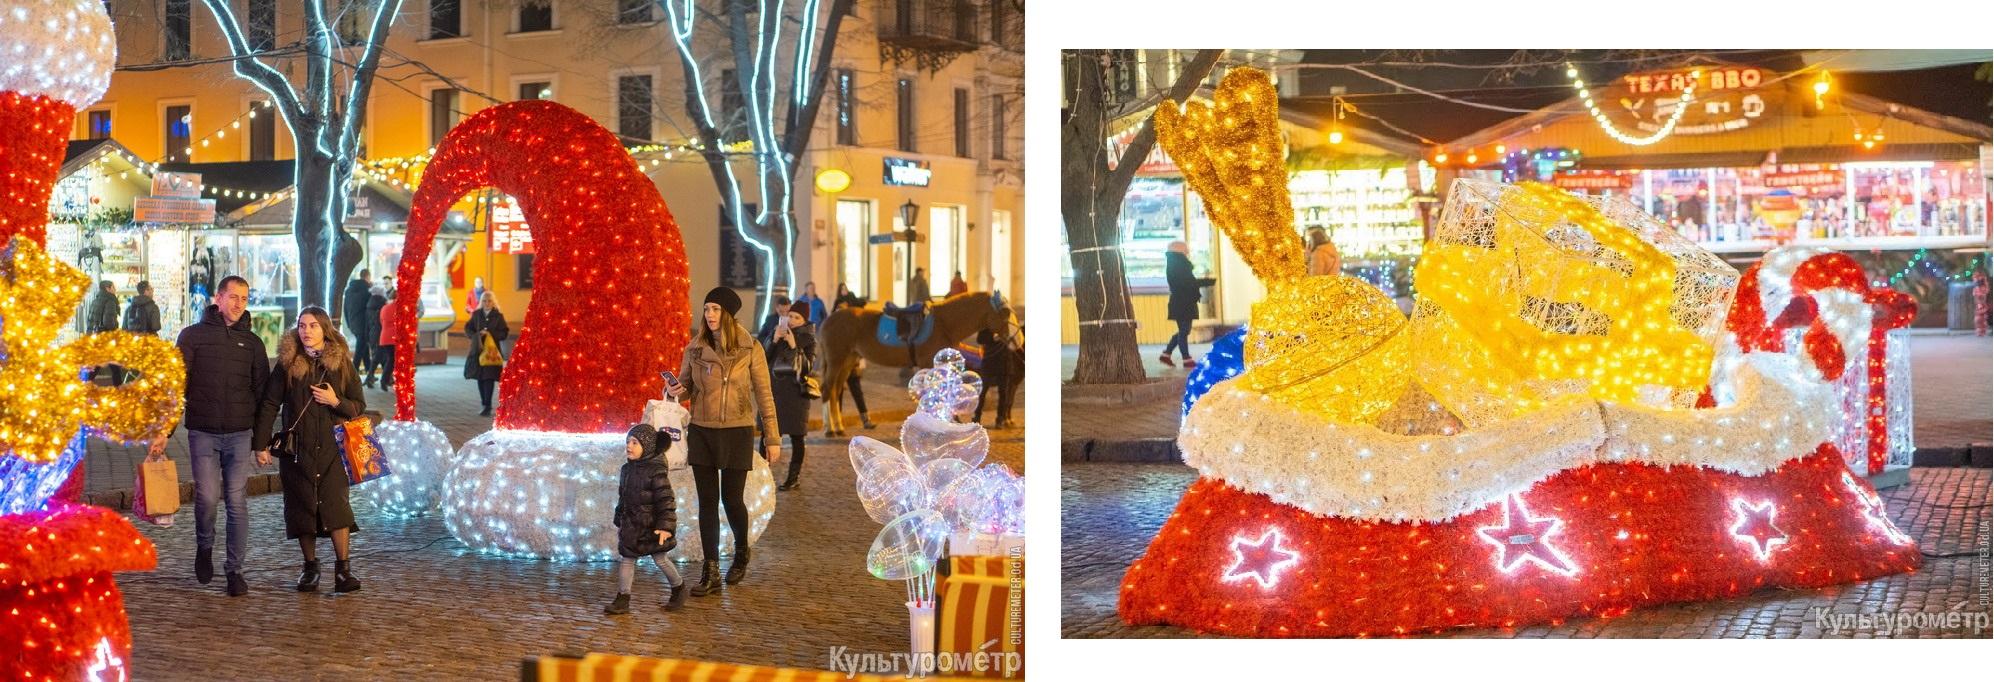 Улица Дерибасовска, коллаж Liga.net, фото: Культурометр